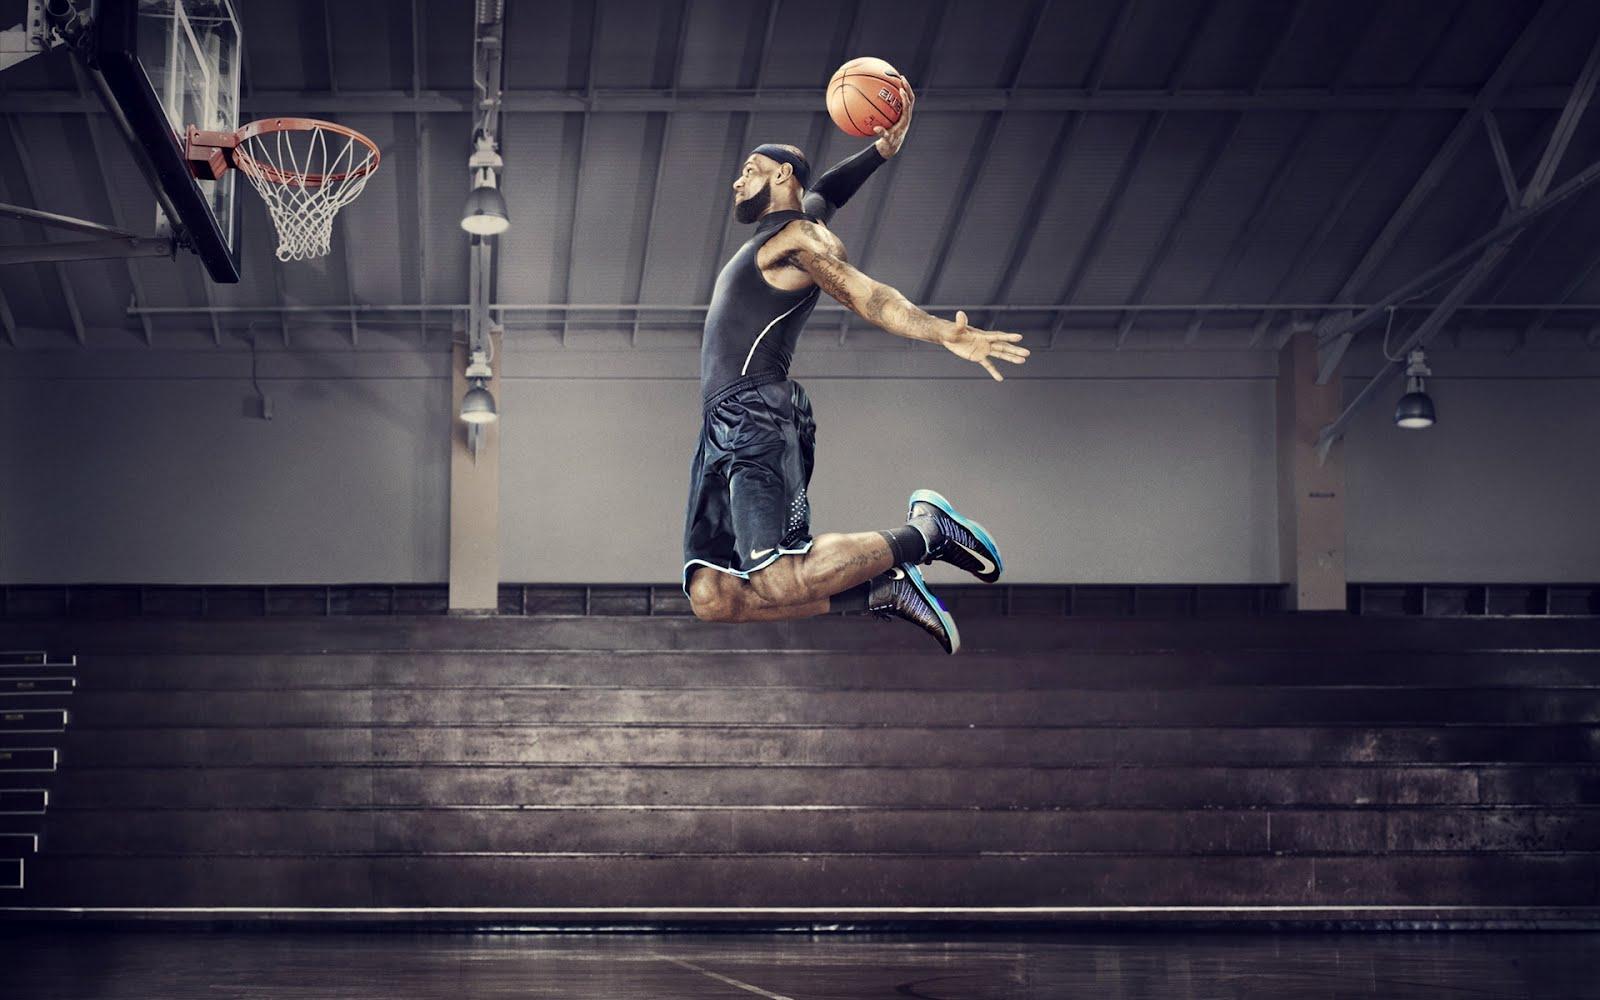 http://3.bp.blogspot.com/-CzwOc7ki6JE/T7sDOPaJg9I/AAAAAAAA480/ImBCvsRnIm4/s1600/nike-basketball-1920x1200-wallpaper-basquetbolista-jugadores-deportes.jpg